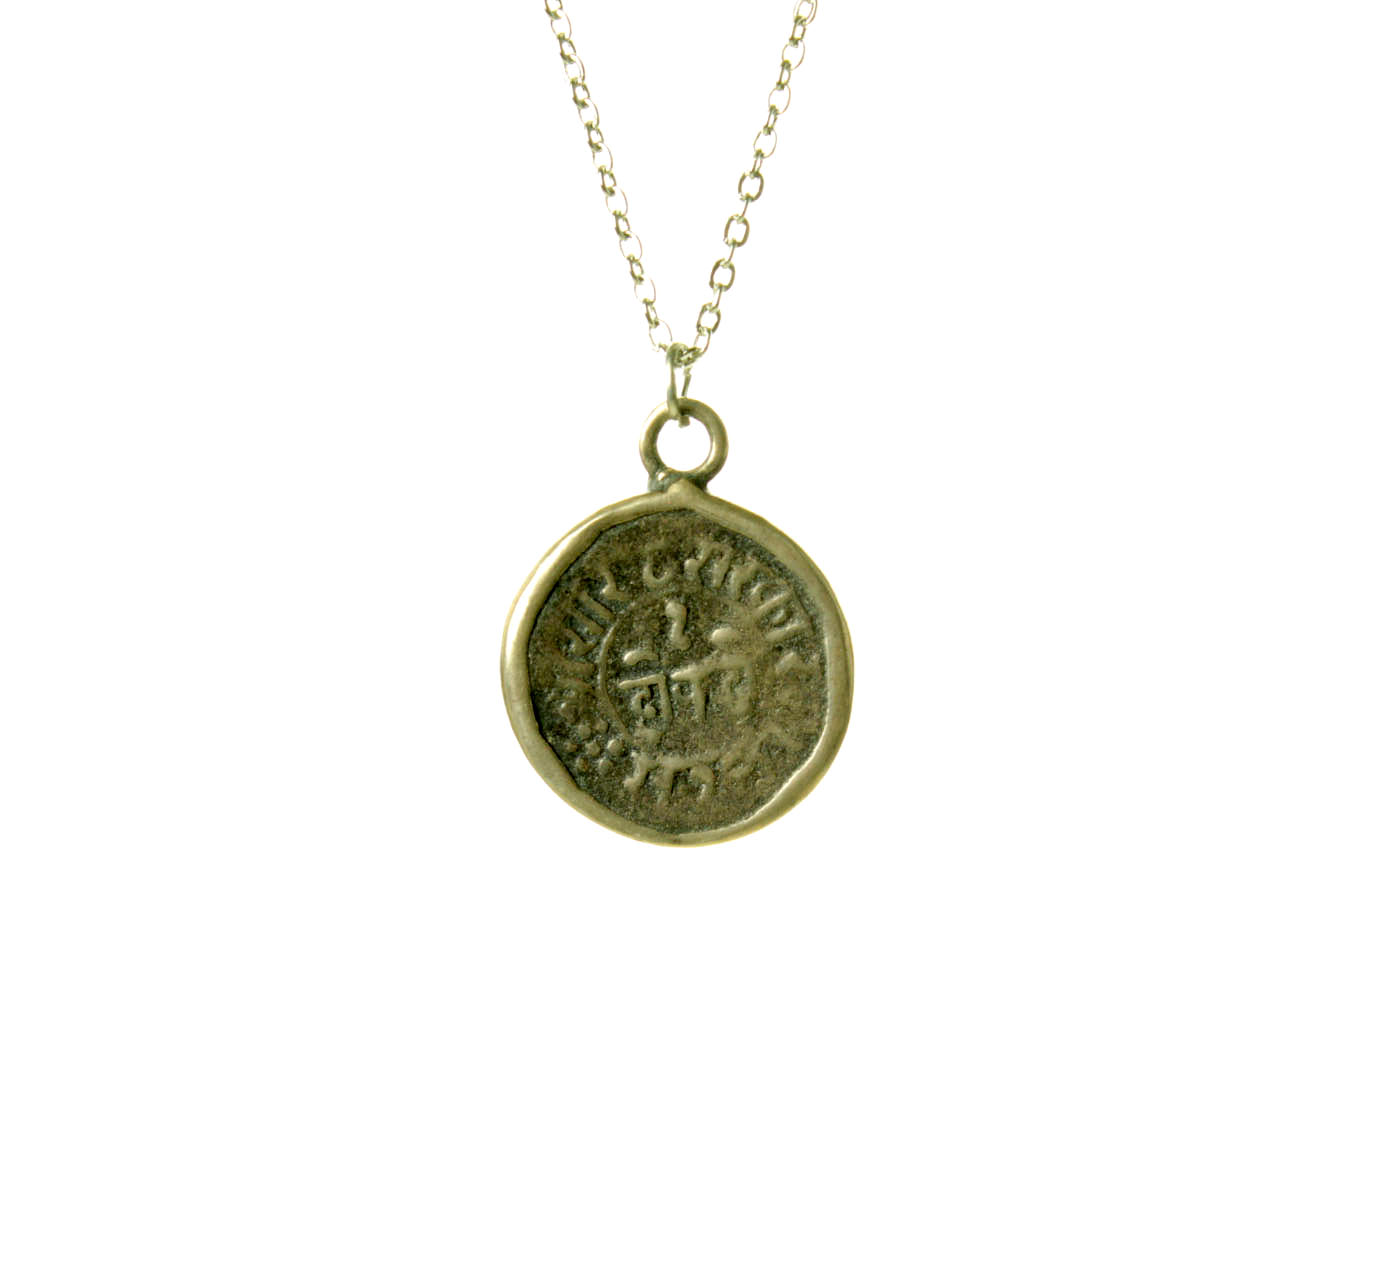 Antiqued romangreek coin pendant 3452 sadco antiqued romangreek coin pendant 3452 mozeypictures Choice Image